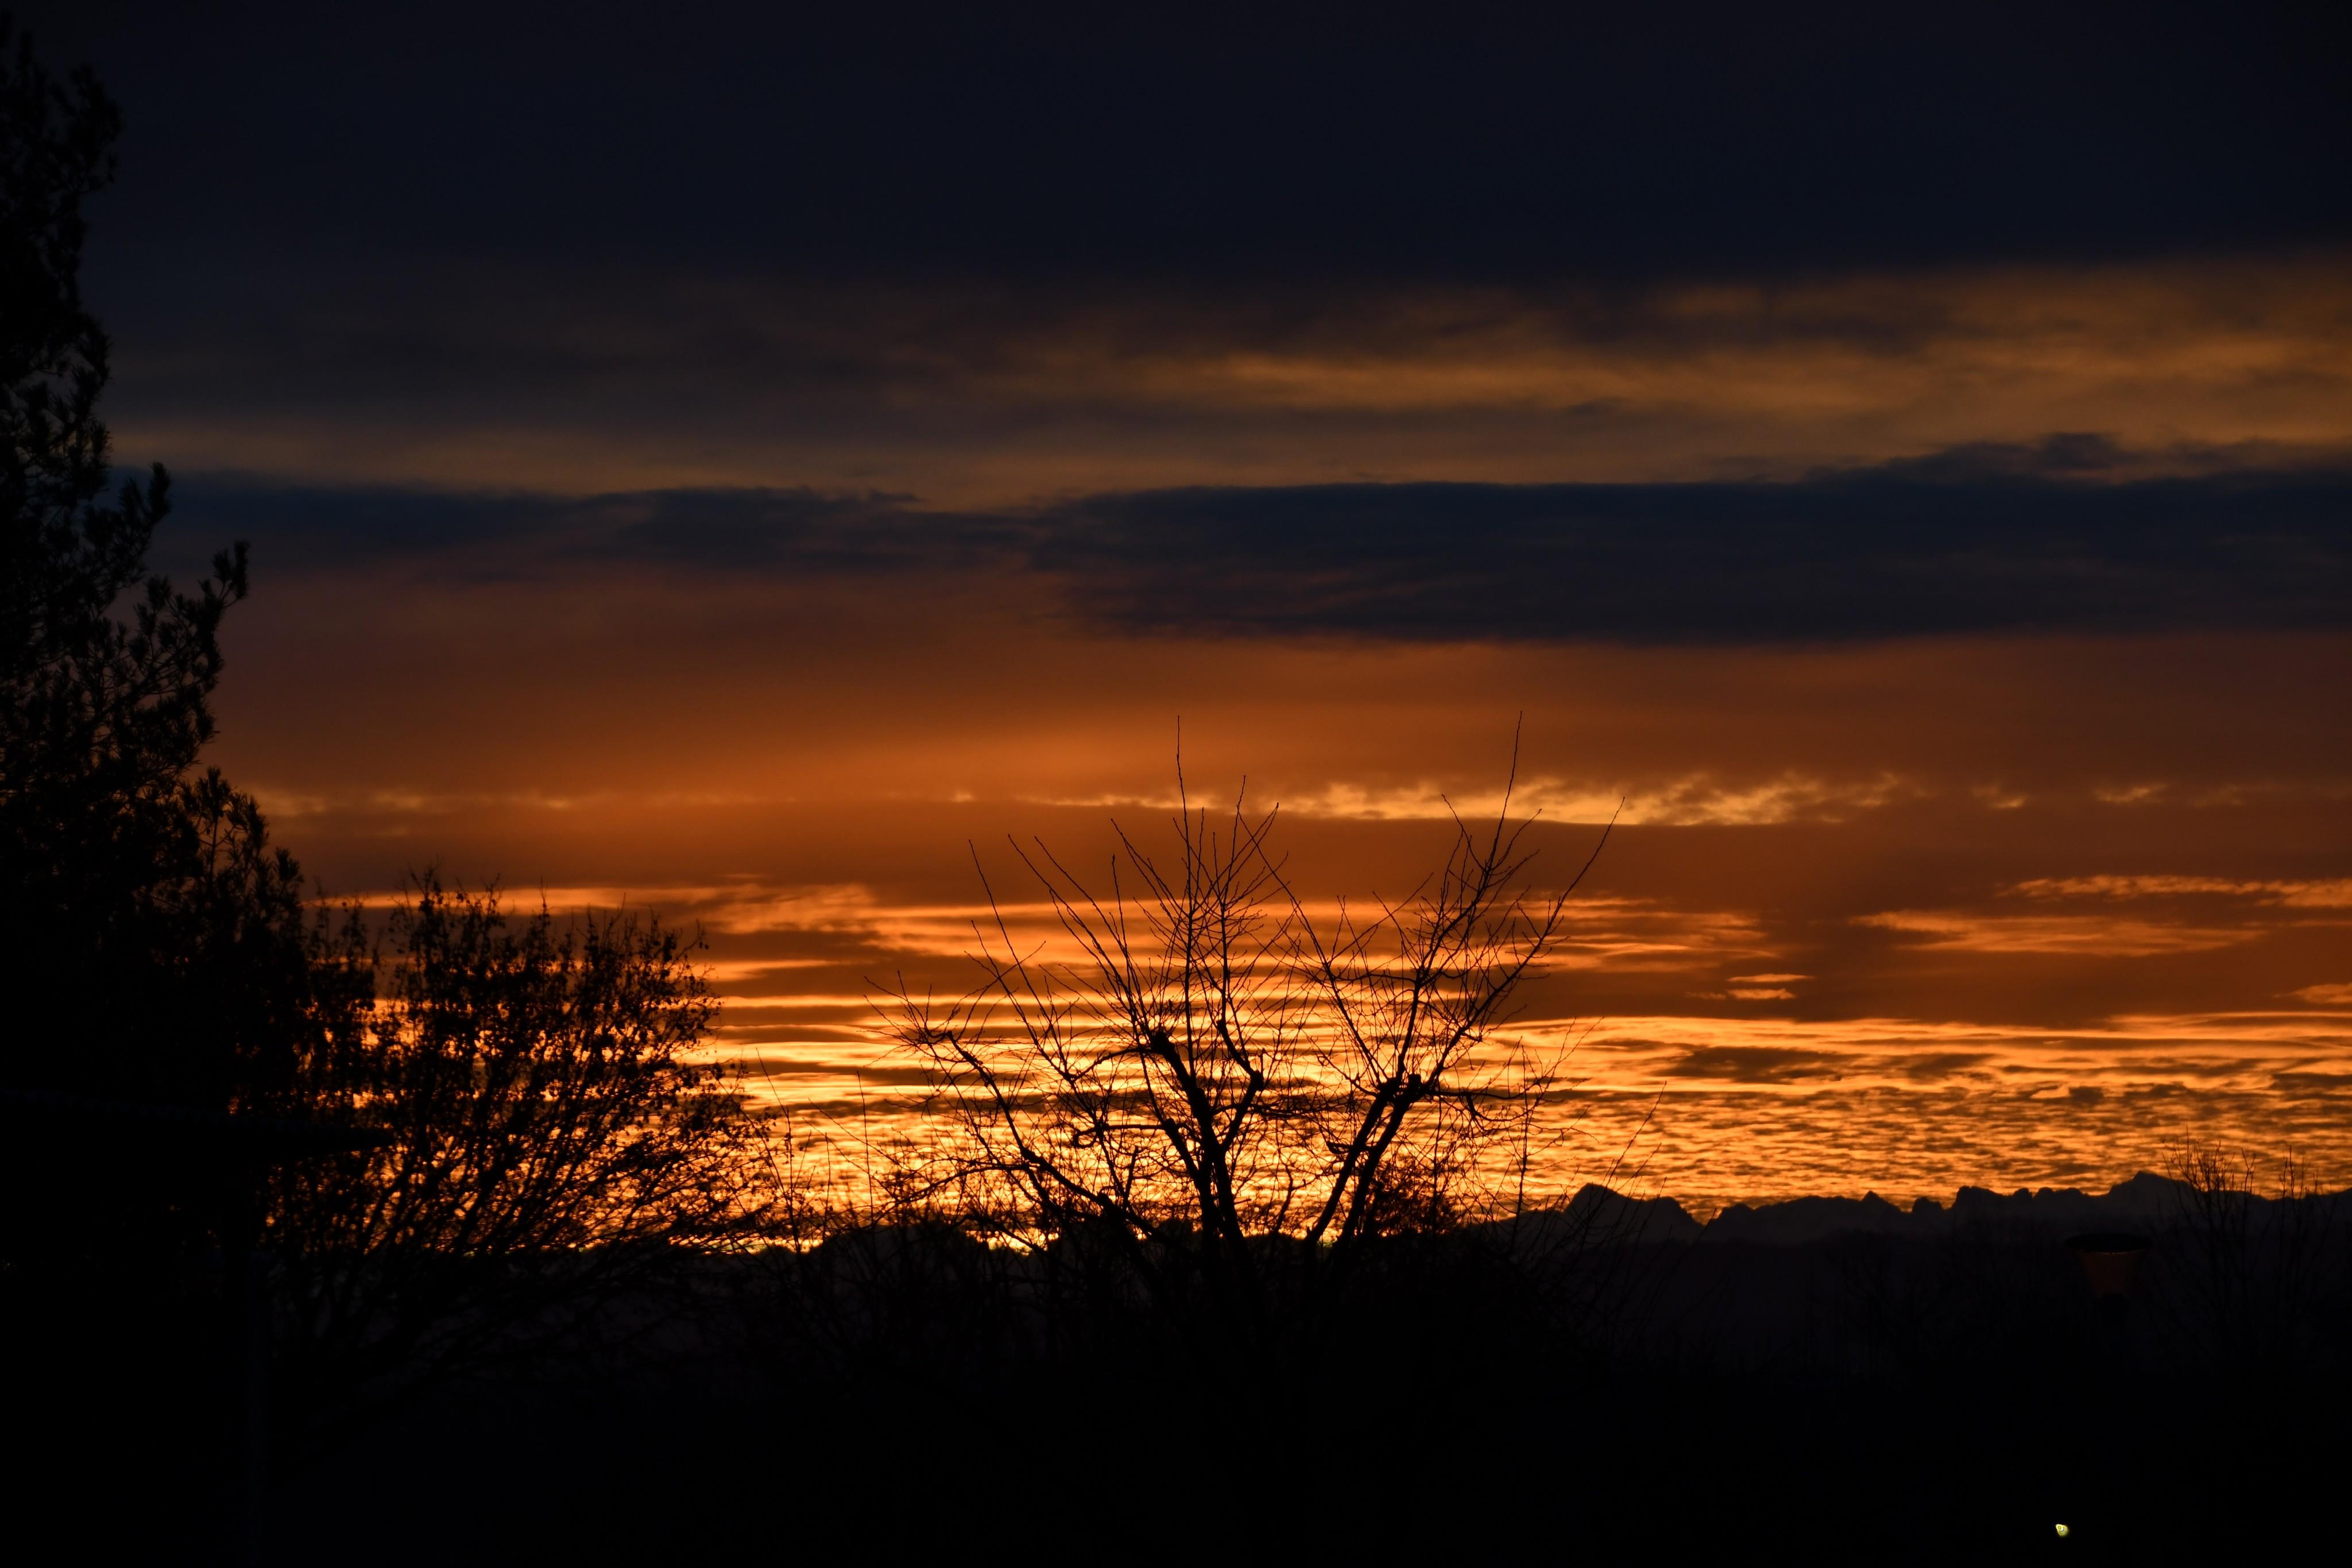 sunrise-a-11.12-3